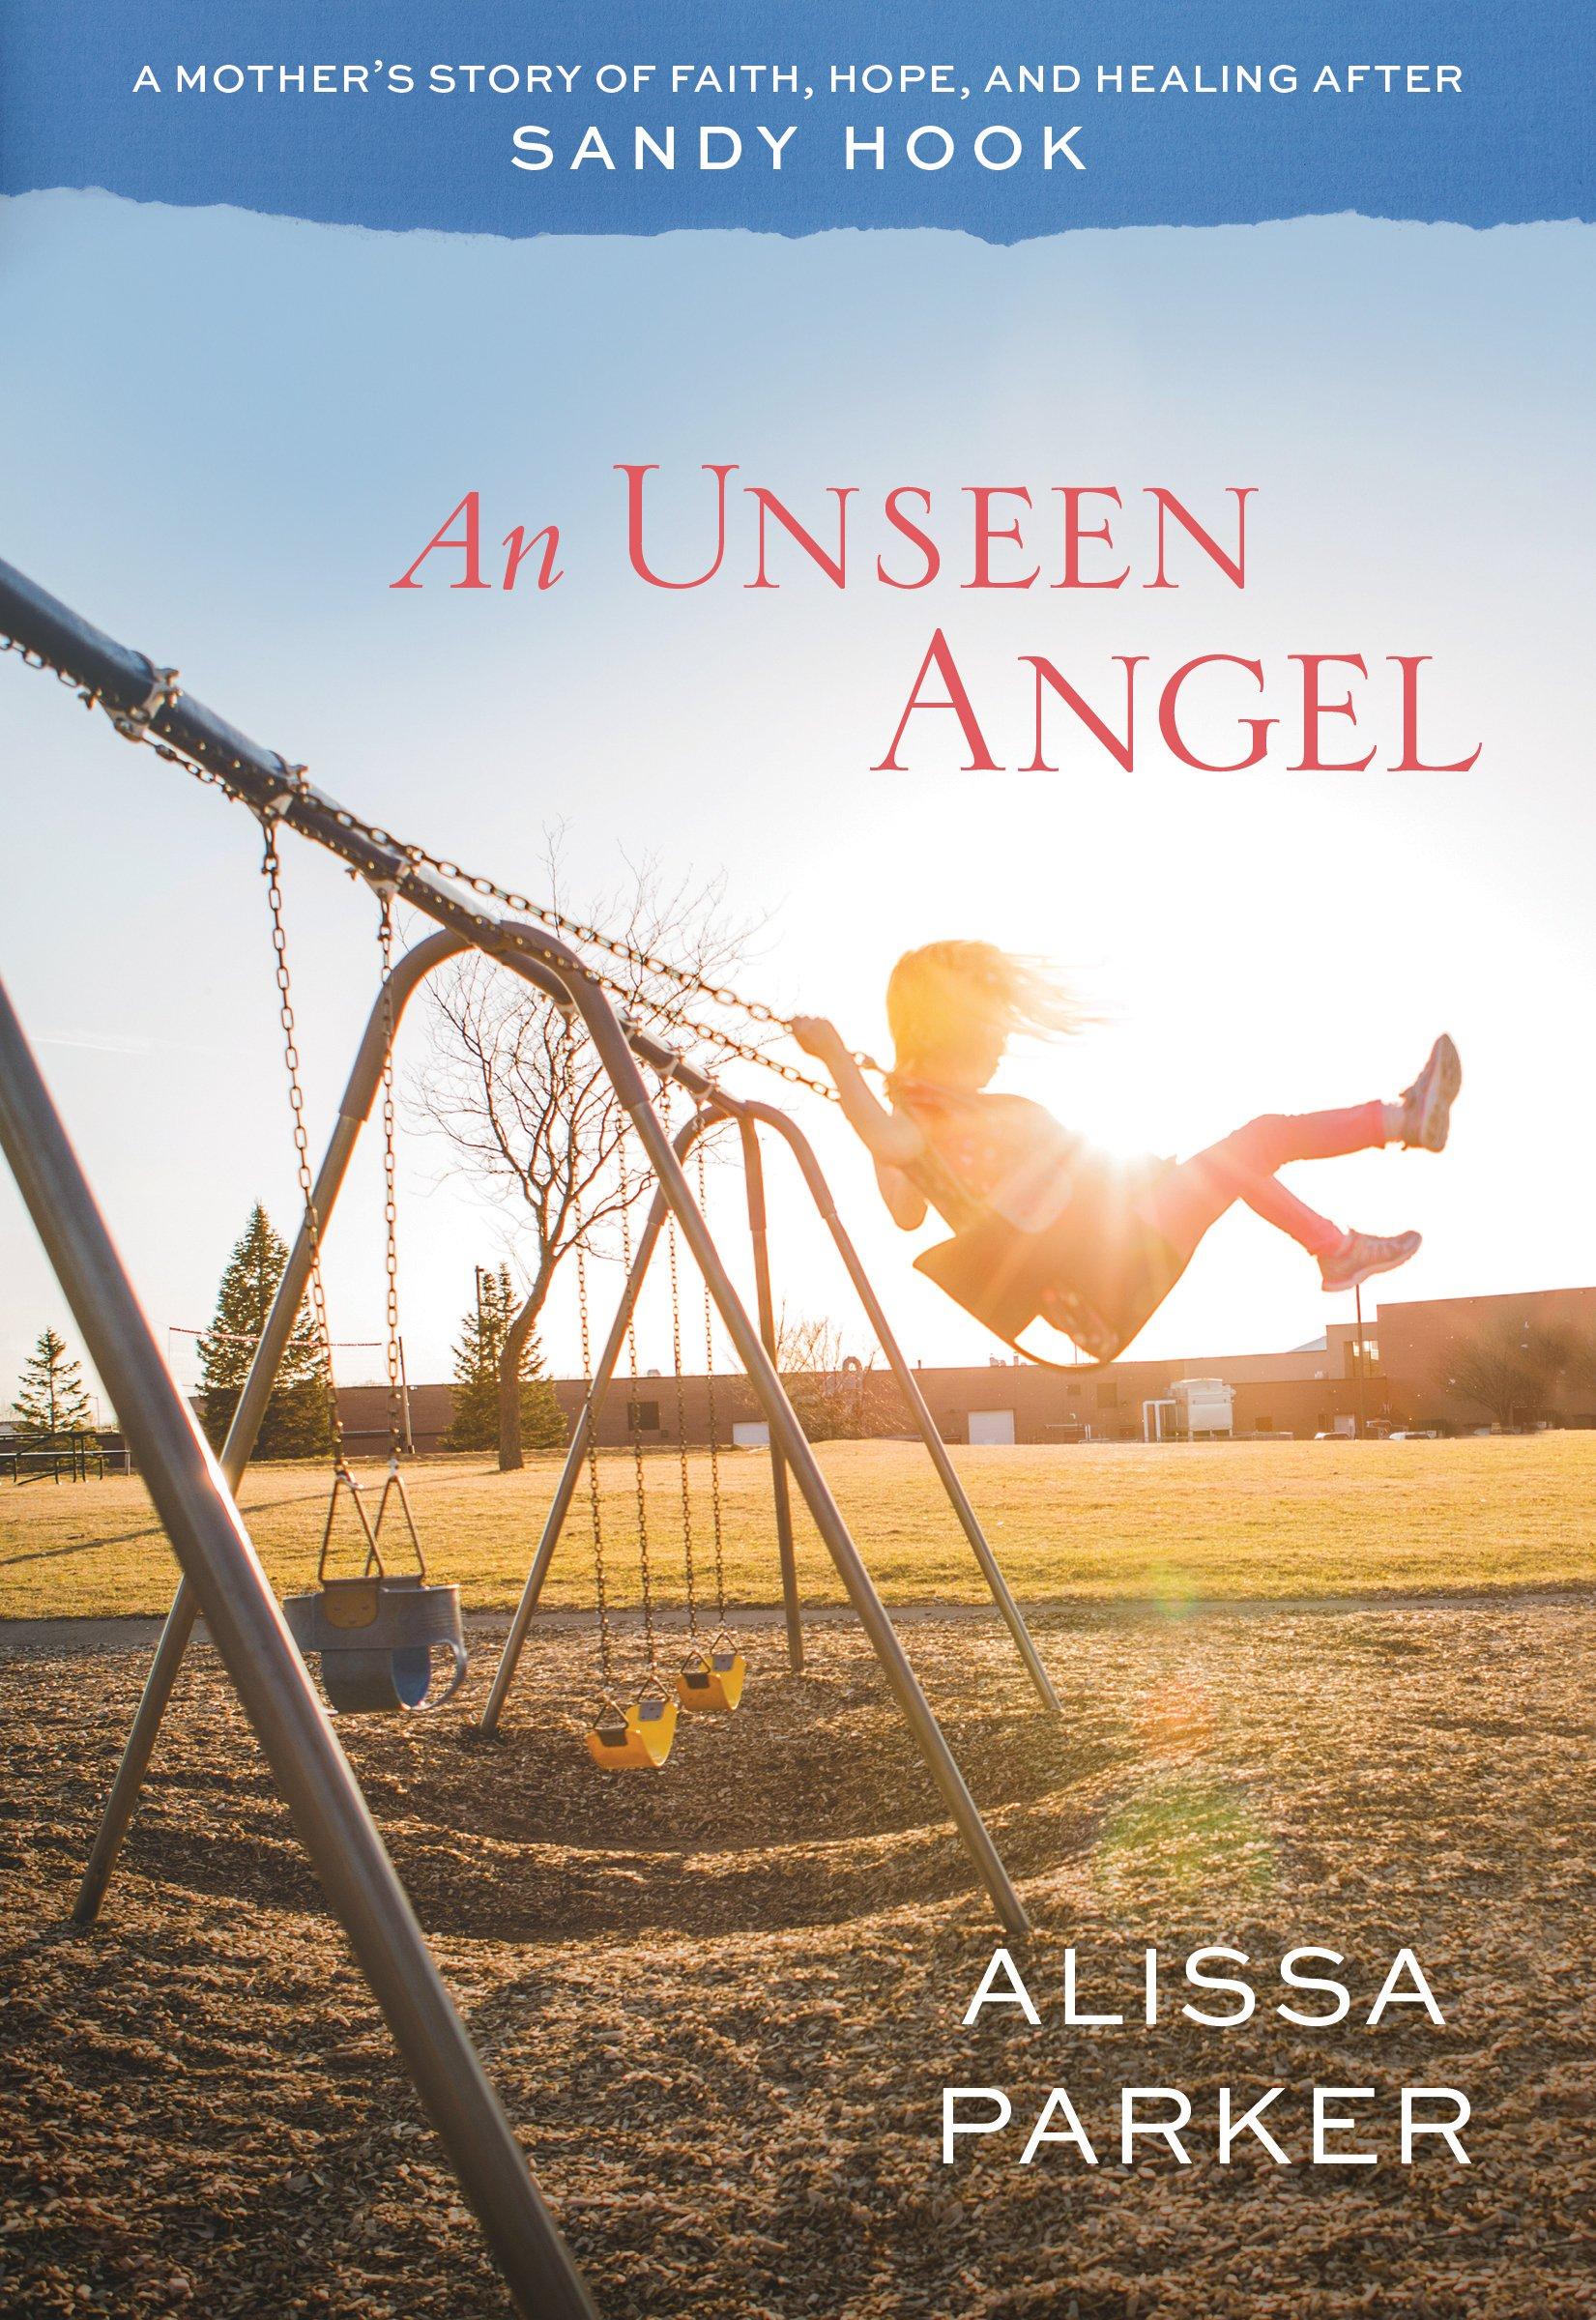 An Unseen Angel  by Alissa Parker